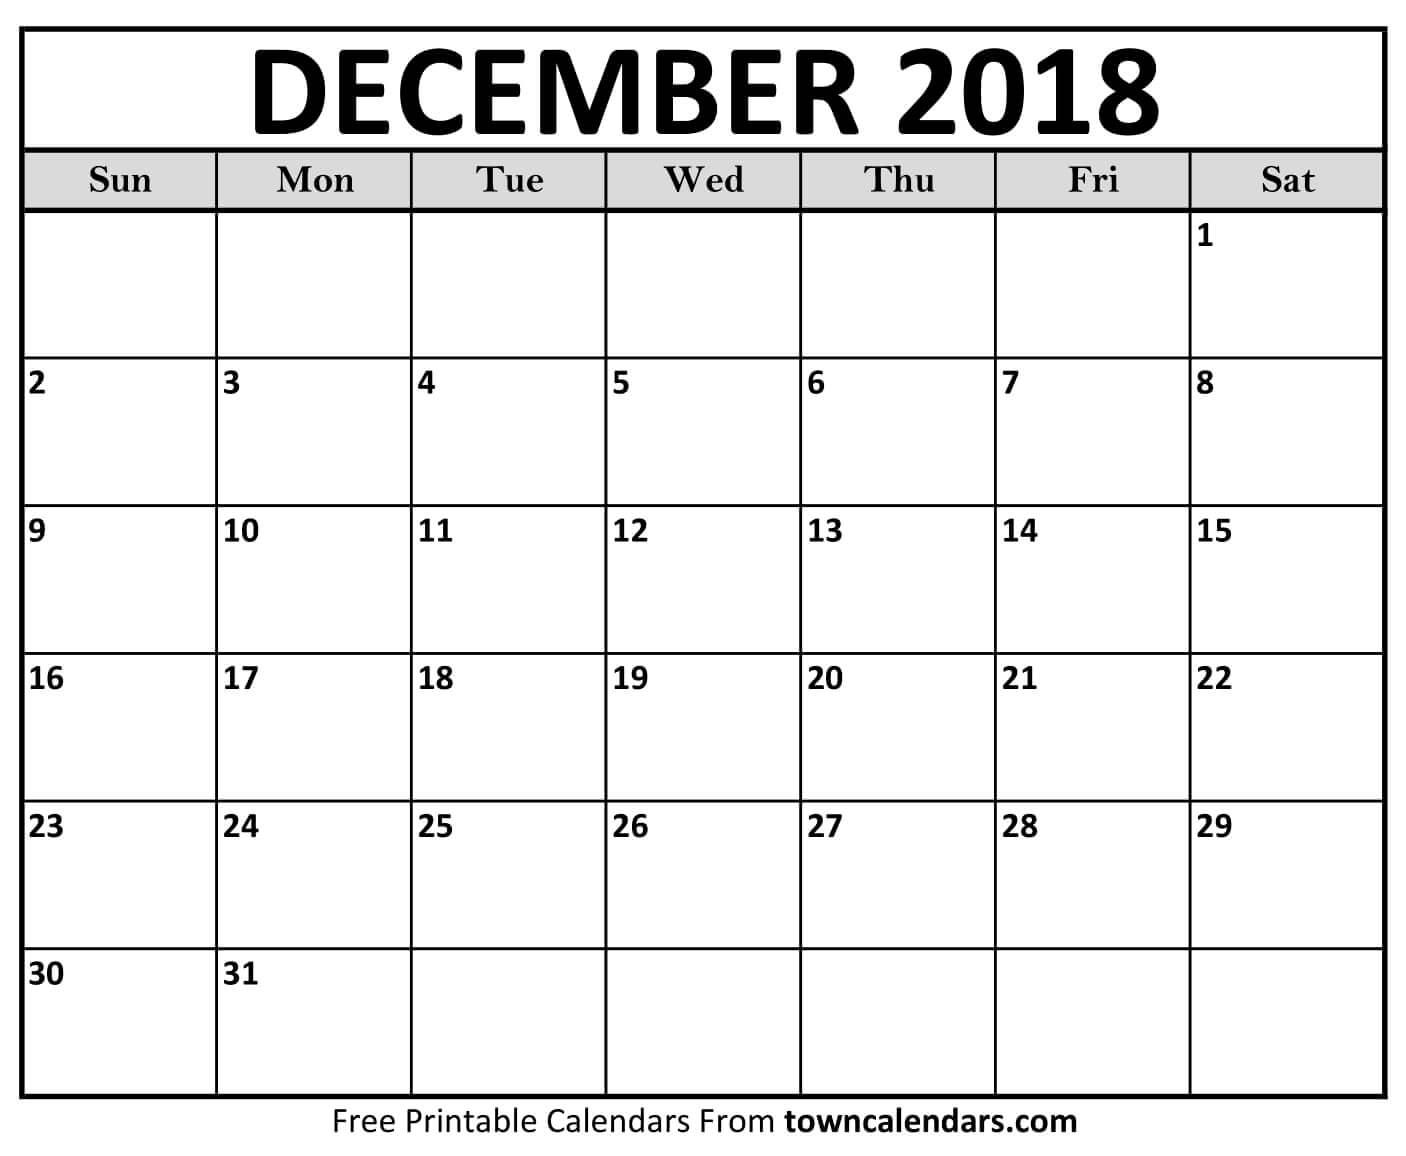 Printable 2018 December Calendar Template - Printable Calendar 2019 regarding December Blank Calendar Page Printable